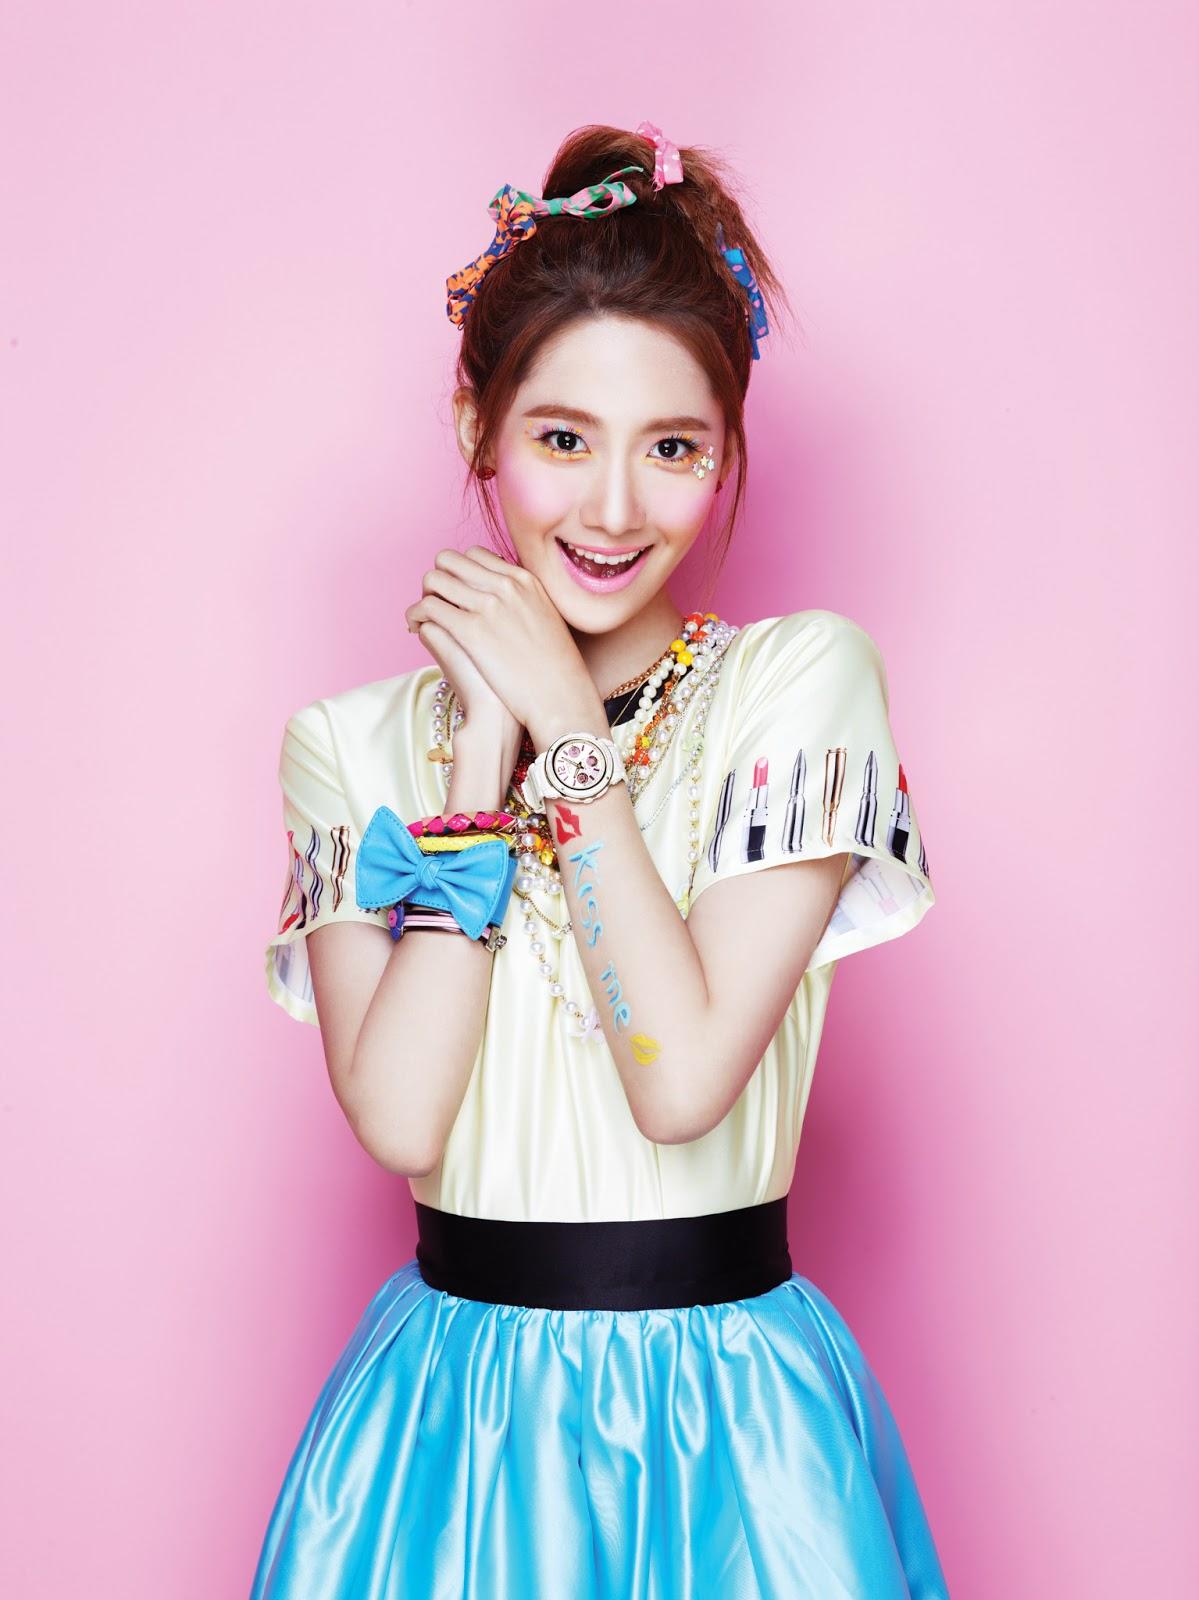 Im Yoona Movie List Cheap girls' generation daily: april 2012